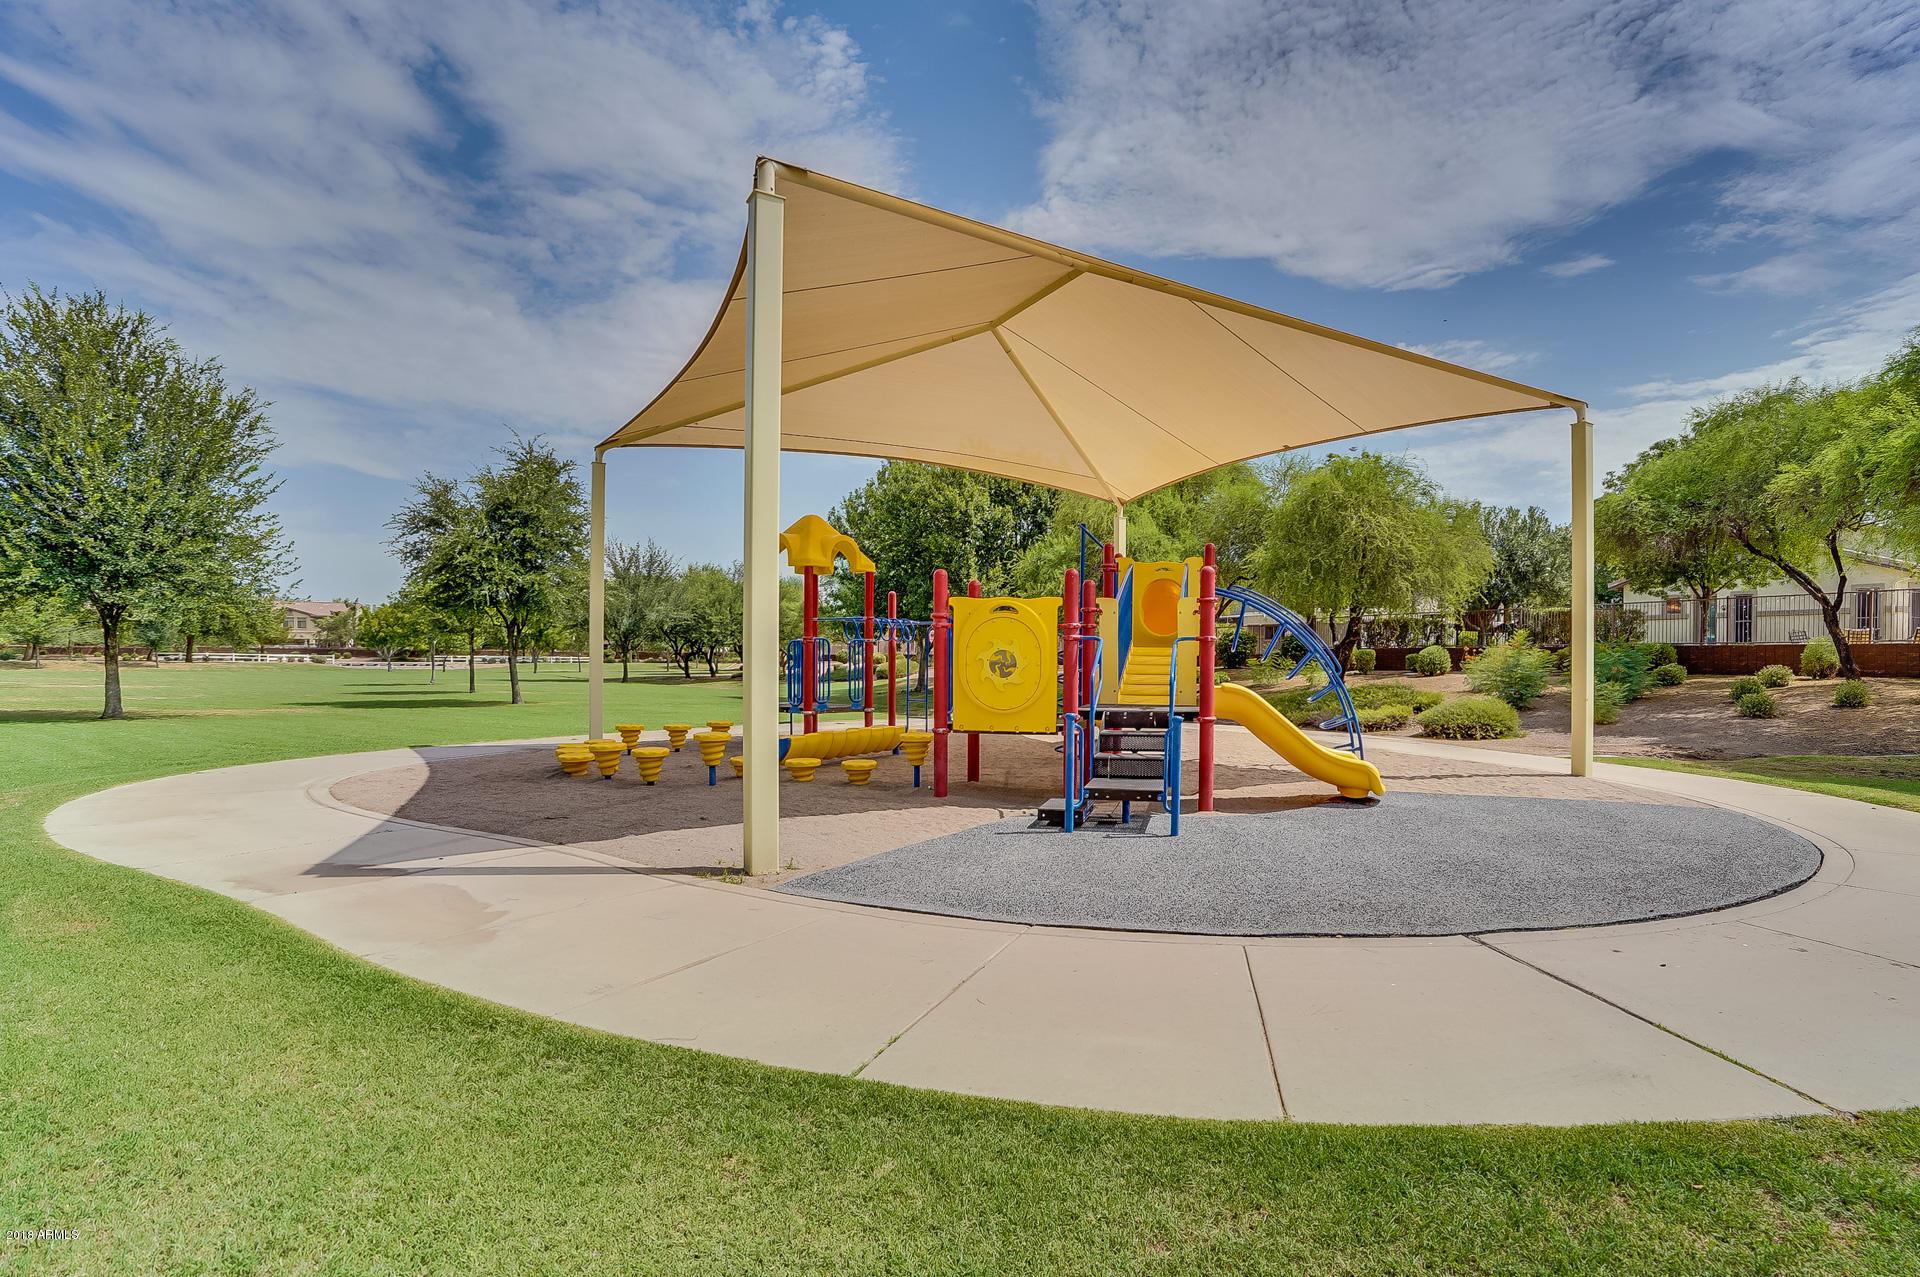 MLS 5798817 20604 S 186TH Place, Queen Creek, AZ 85142 Queen Creek AZ Sossaman Estates